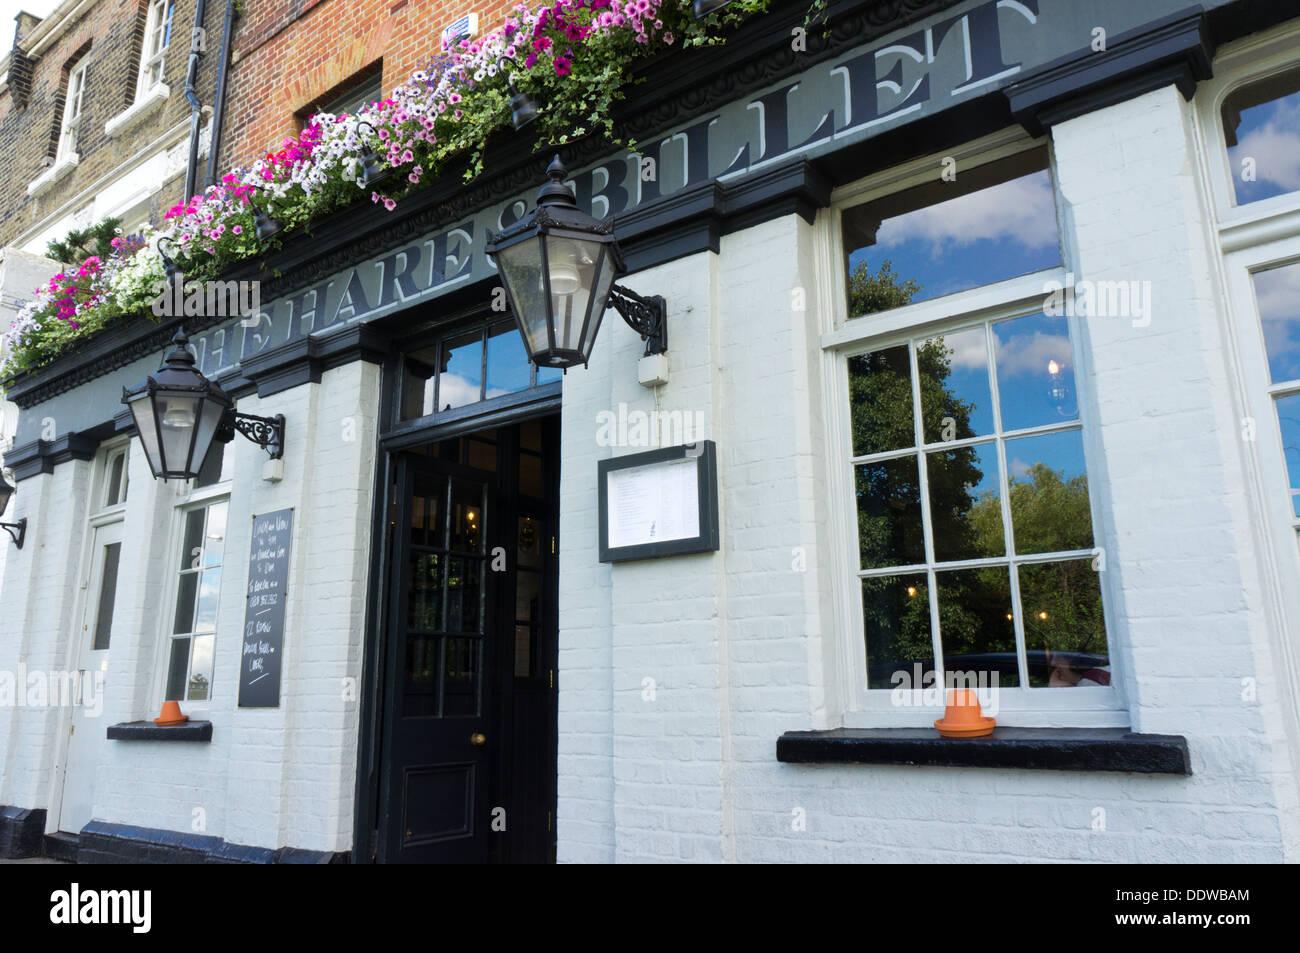 The Hare & Billet pub in Blackheath, London. - Stock Image